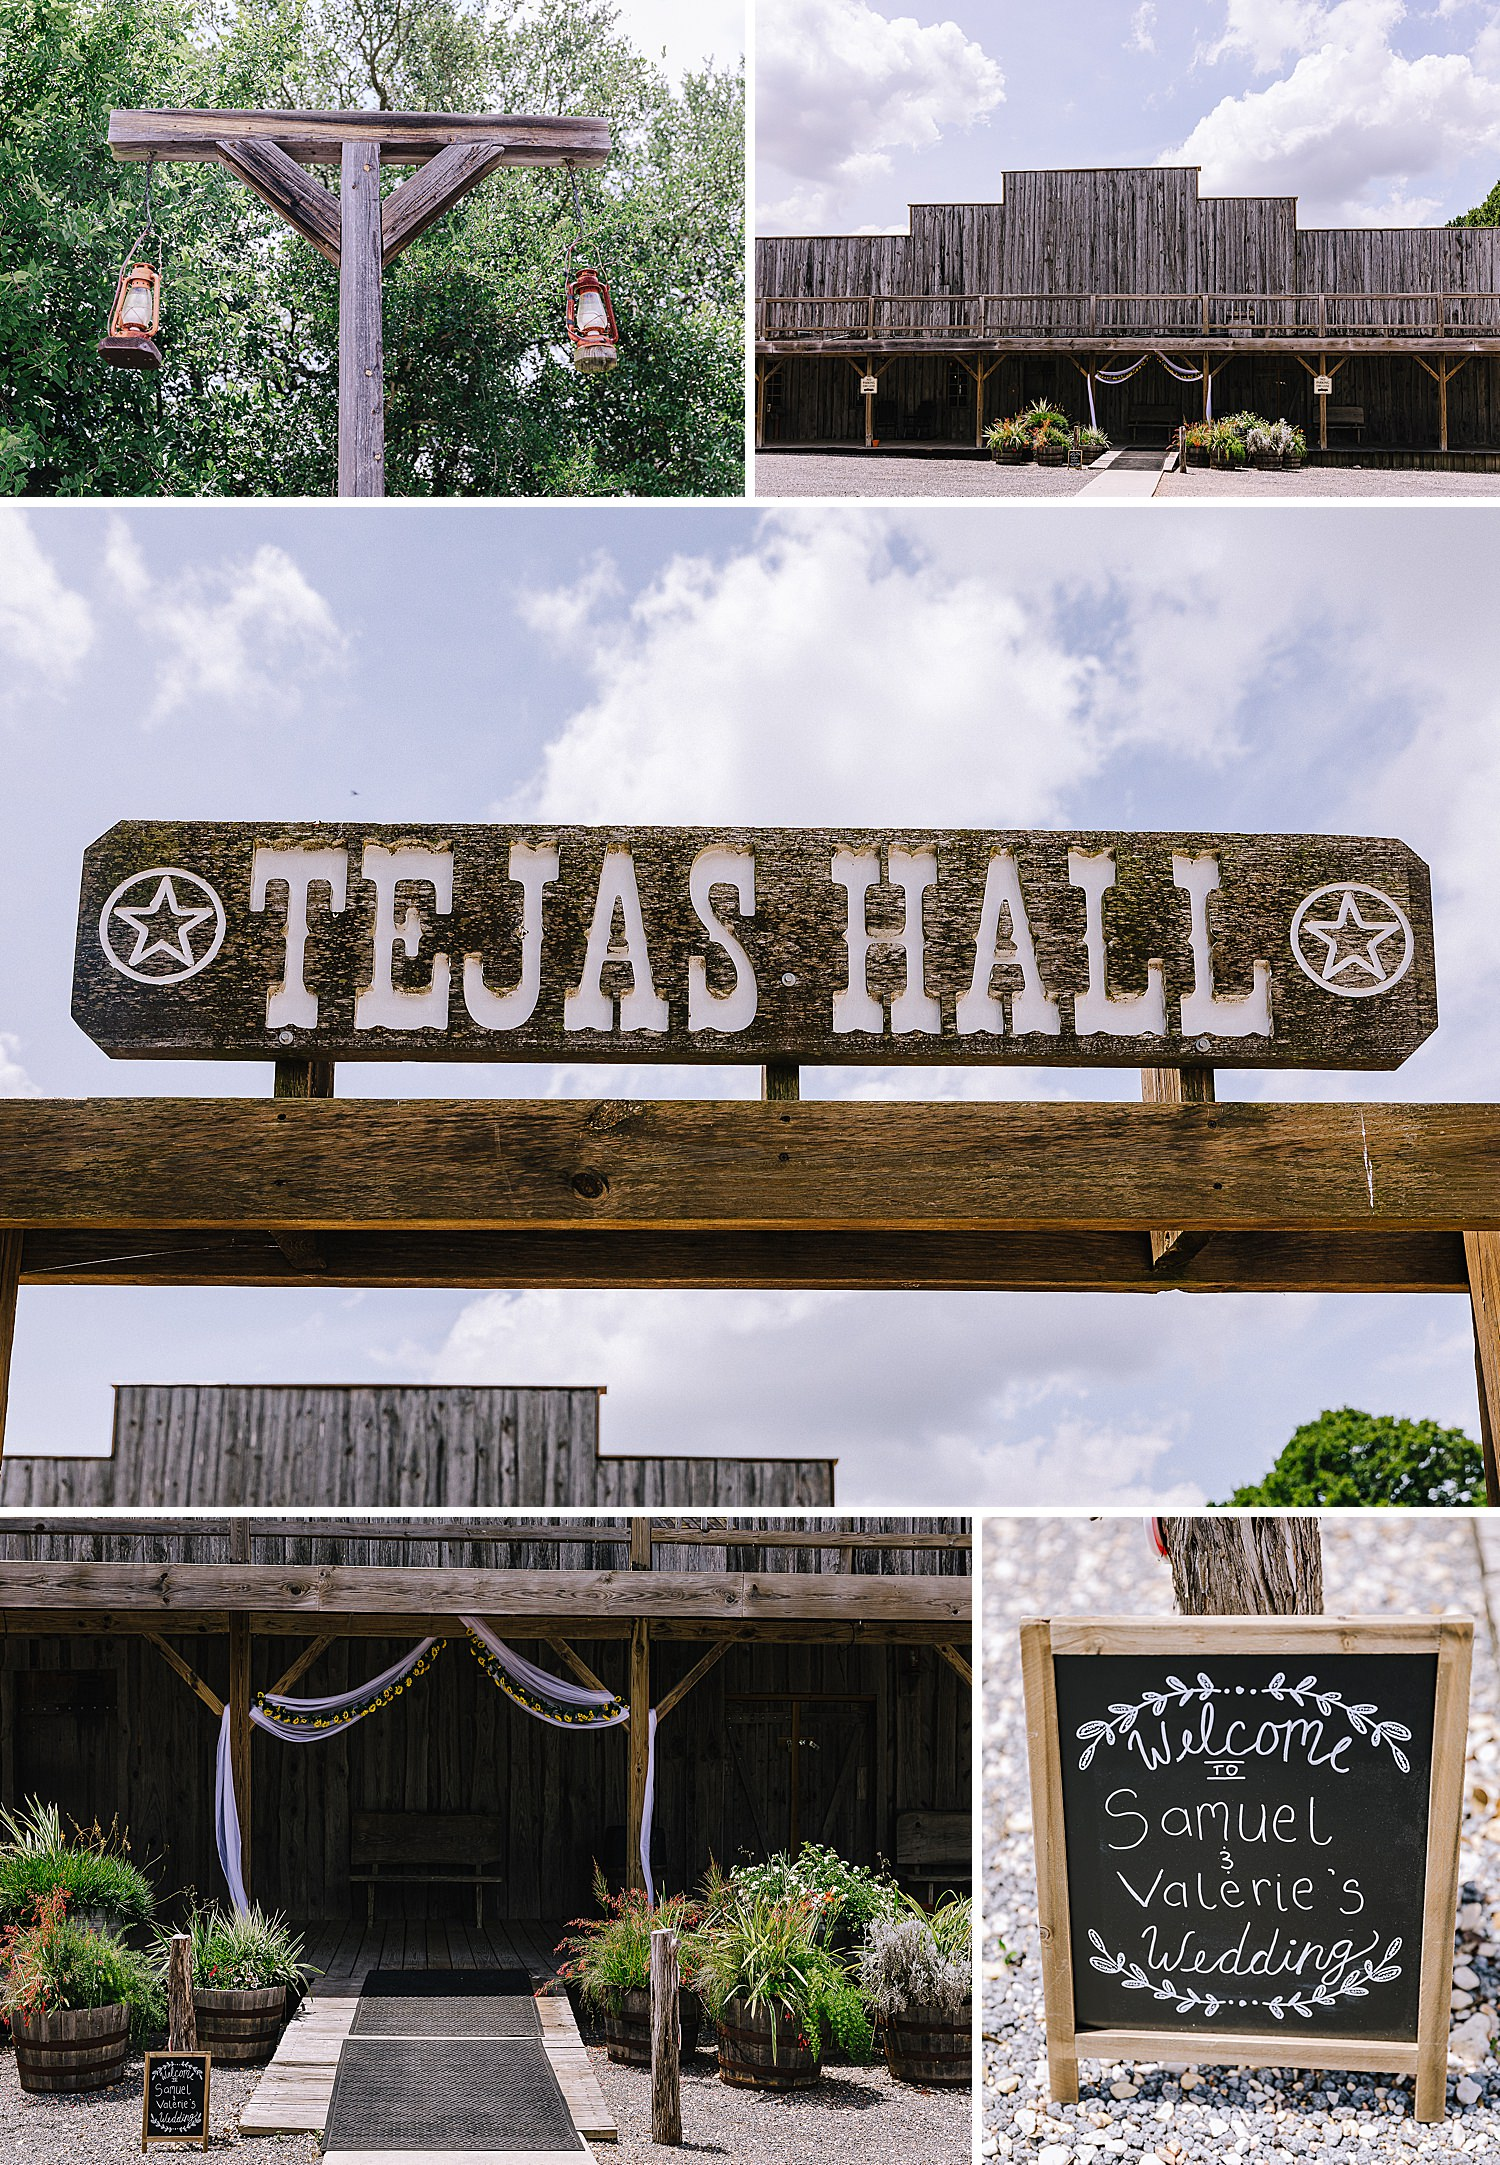 Carly-Barton-Photography-Old-Town-Texas-Rustic-Wedding-Photos-Sunflowers-Boots-Kyle-Texas_0002.jpg